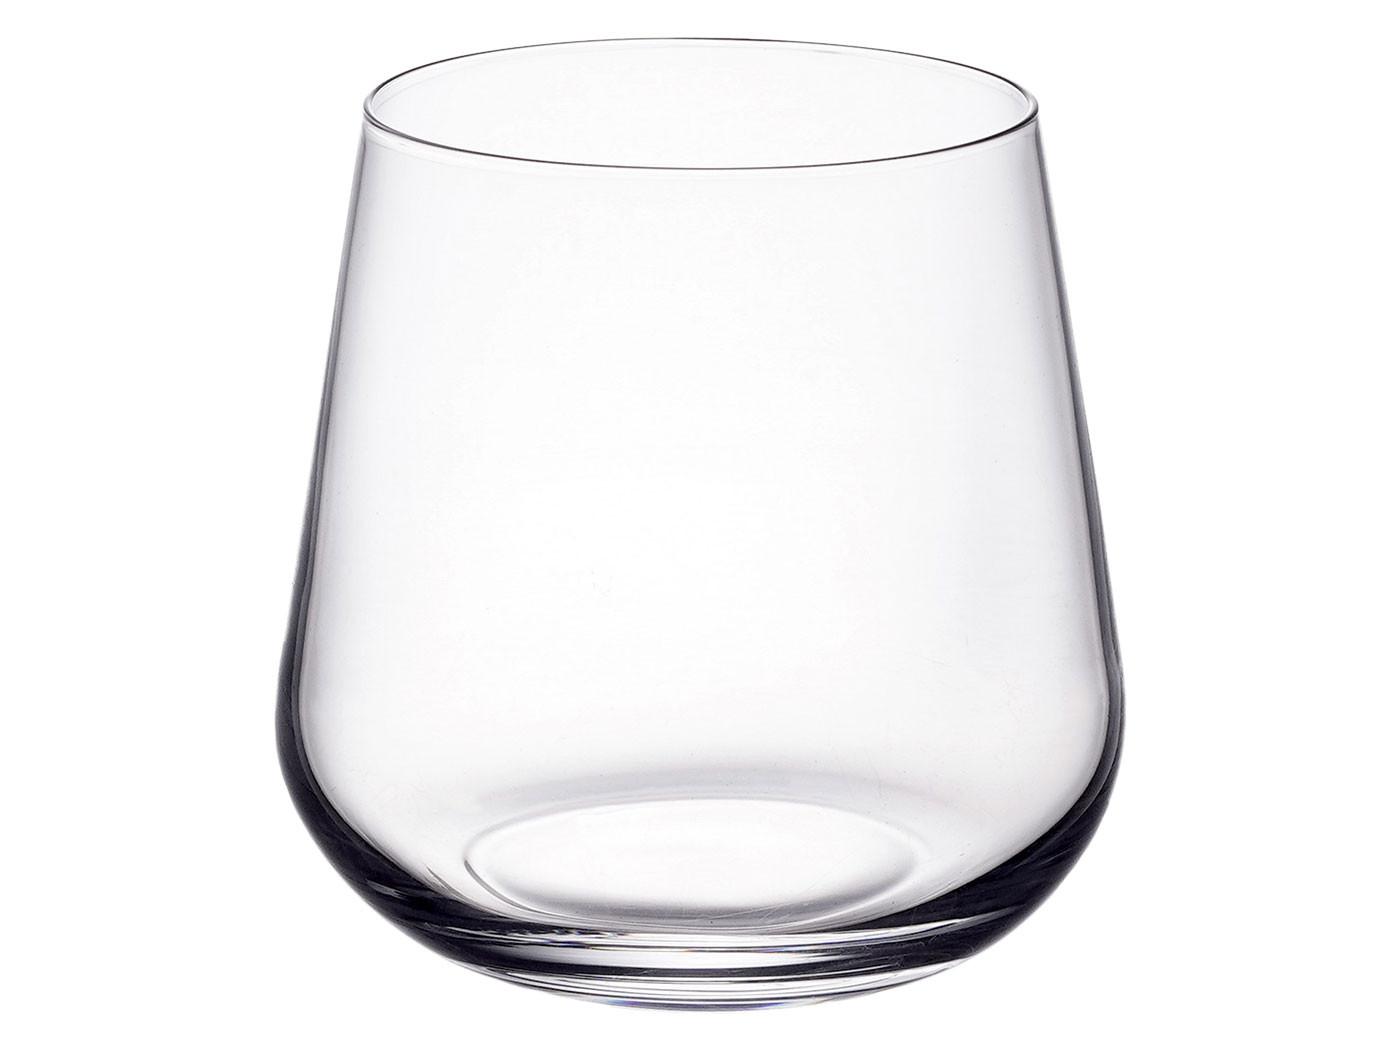 Фото - Набор стаканов Первый Мебельный Набор стаканов для воды Crystalite Bohemia Ardea/Amundsen 320 мл (6 шт) набор бокалов первый мебельный набор бокалов для вина crystalite bohemia ardea amundsen 450мл 6 шт